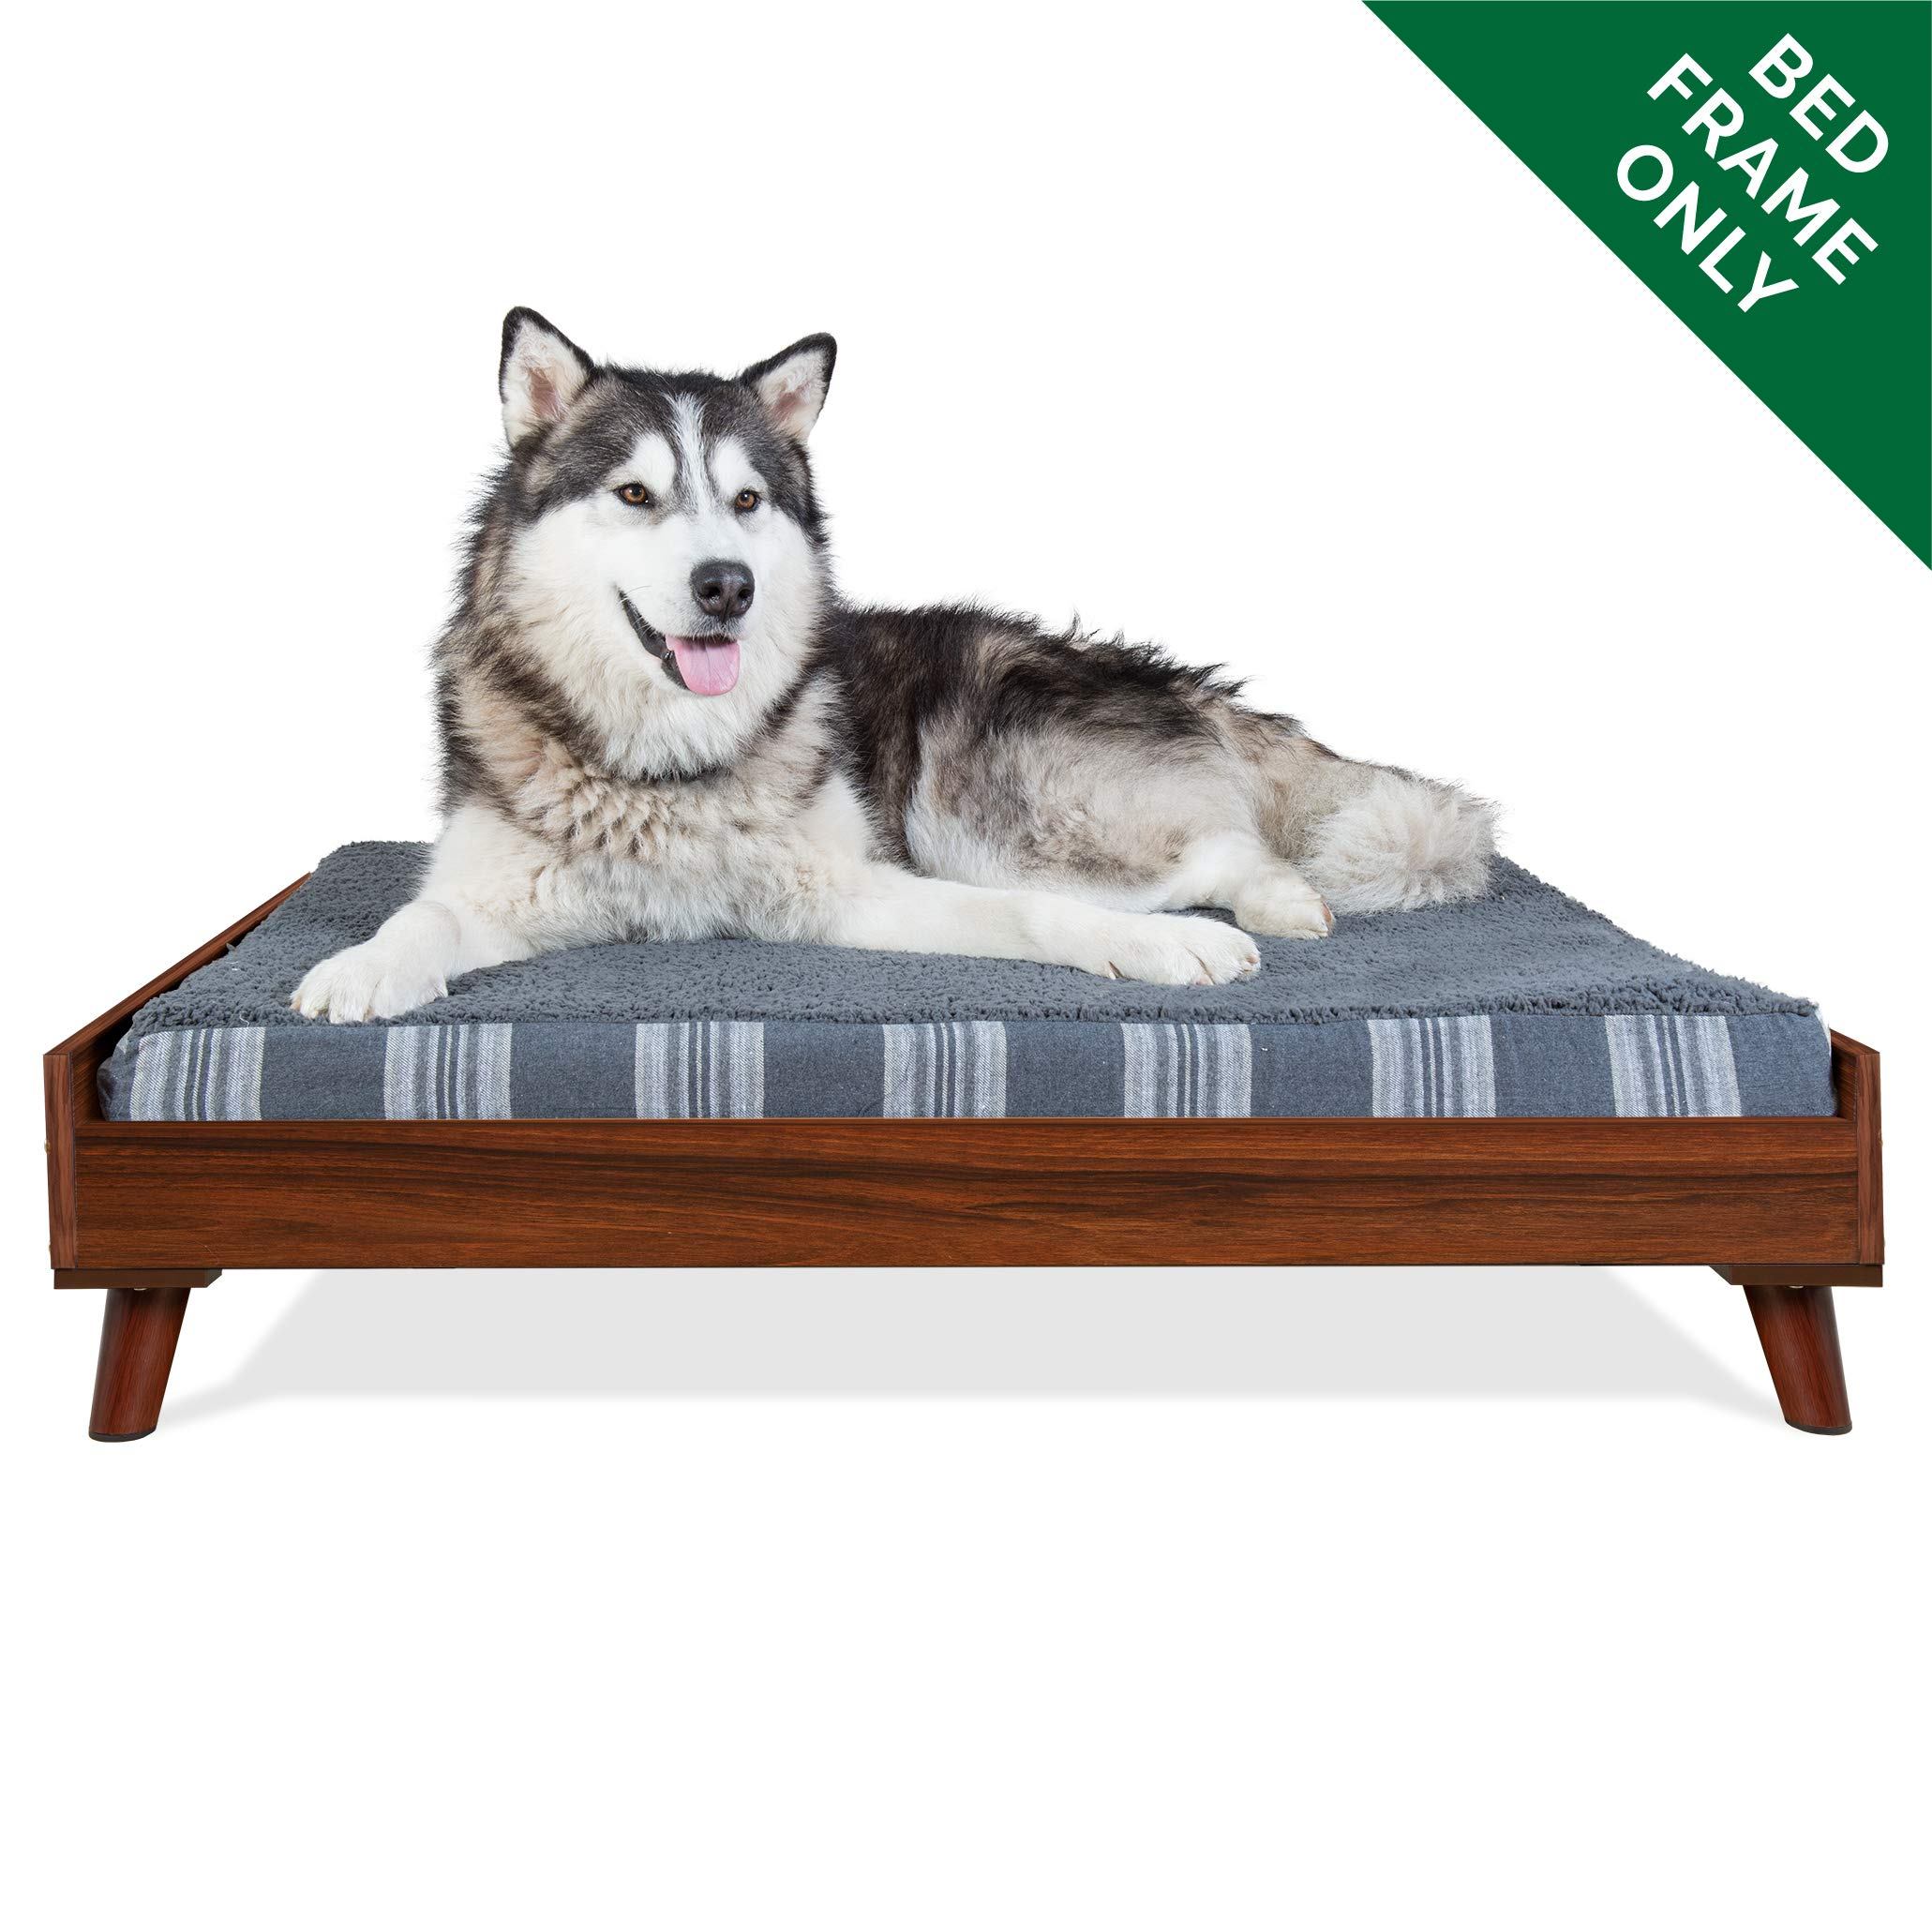 Furhaven Pet Dog Bed Frame | Mid-Century Modern Style Bed Frame Furniture for Pet Beds & Mattresses, Walnut, Jumbo by Furhaven